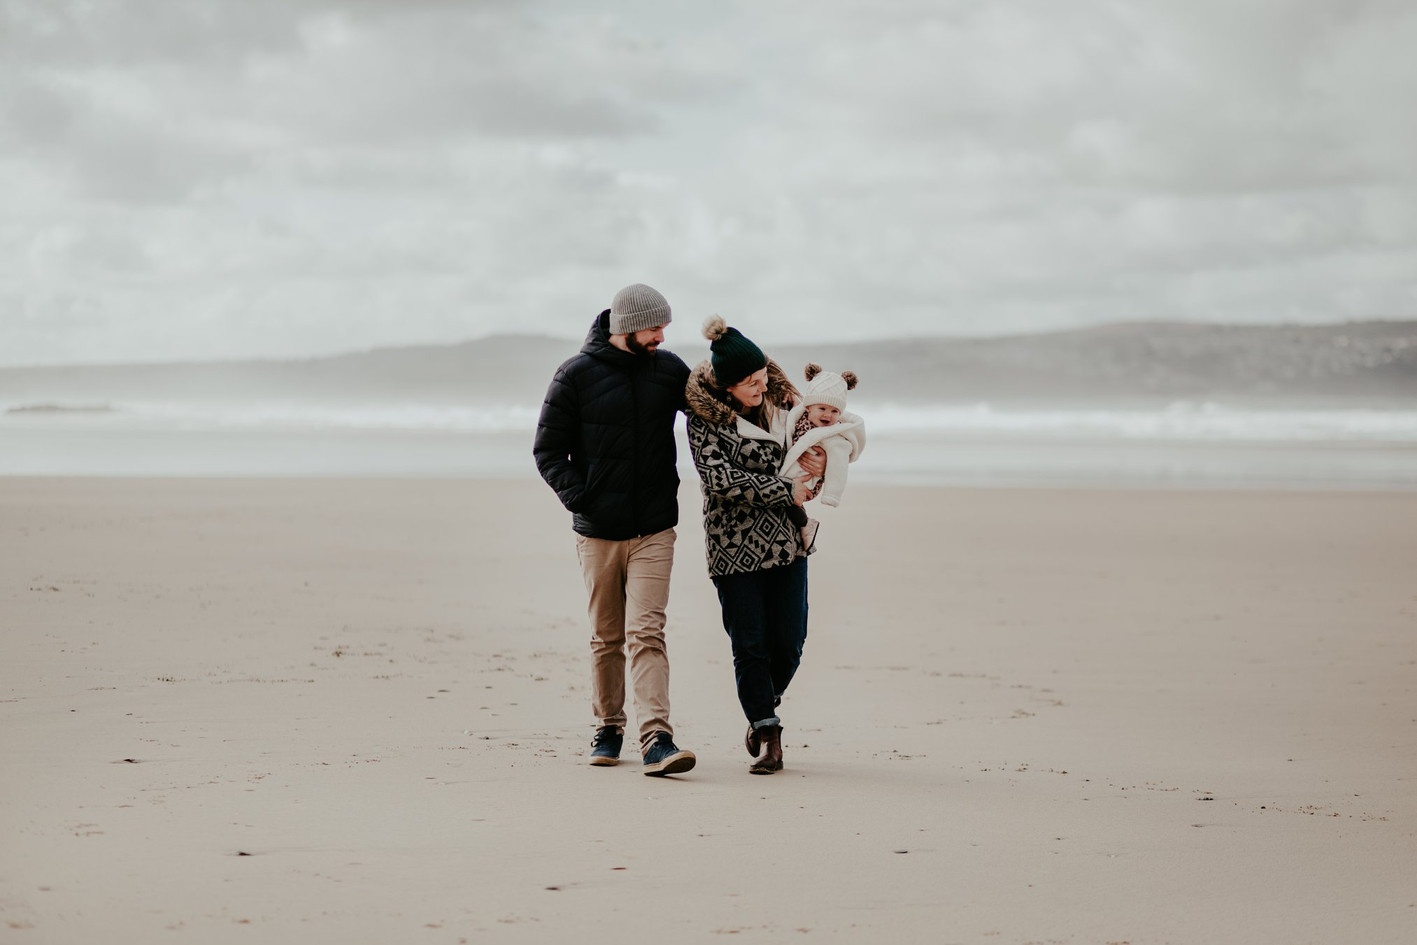 Cornwall-Family_photography-5.jpg